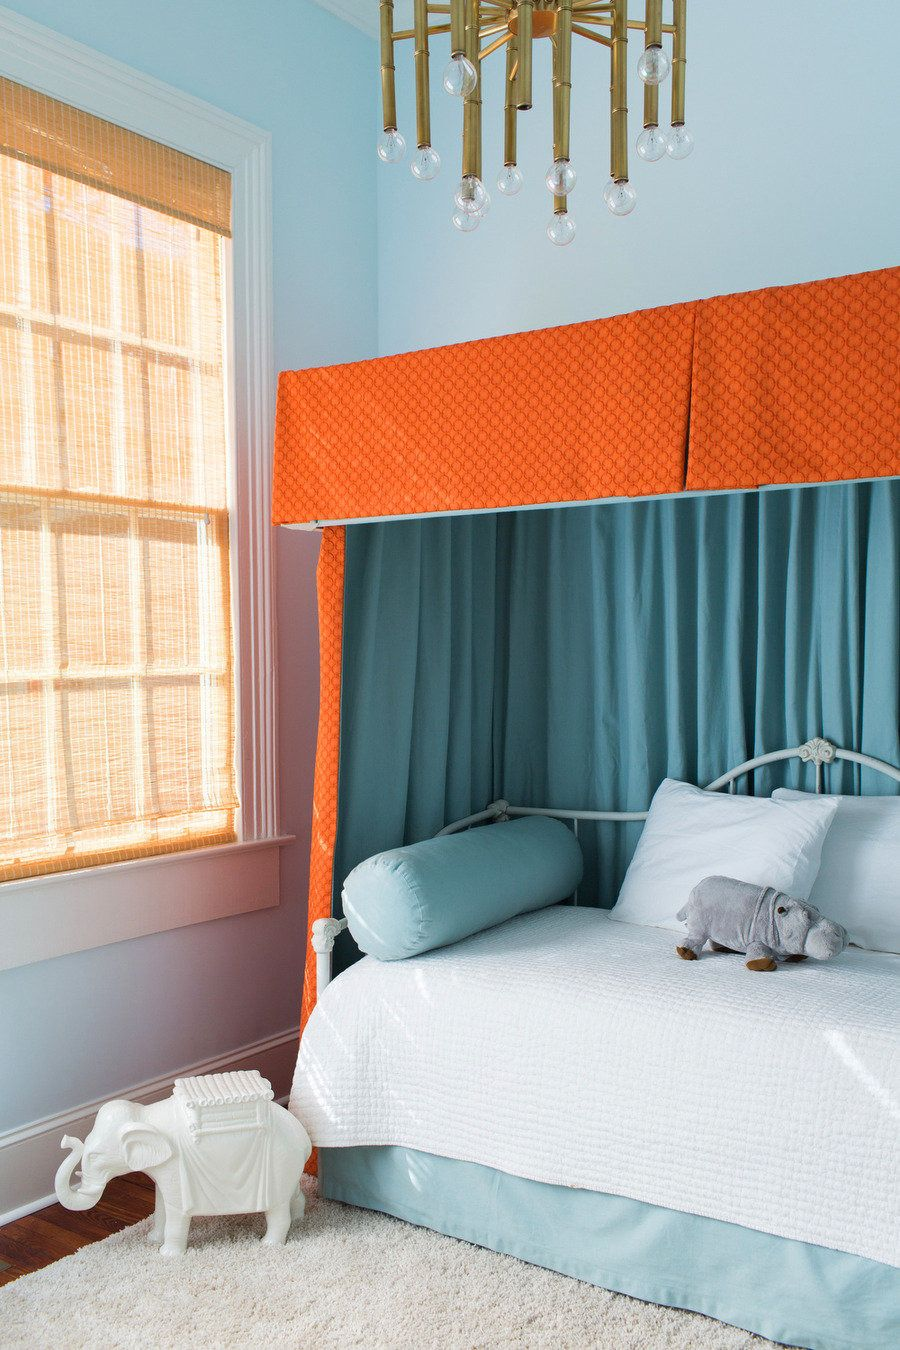 #girls-bedroom  Photography: Corbin Gurkin - corbingurkin.com/ Interior Design: Tara Guerard Interiors - taraguerard.com/interiors/  Read More: http://www.stylemepretty.com/living/2013/07/01/tara-guerard-interiors/